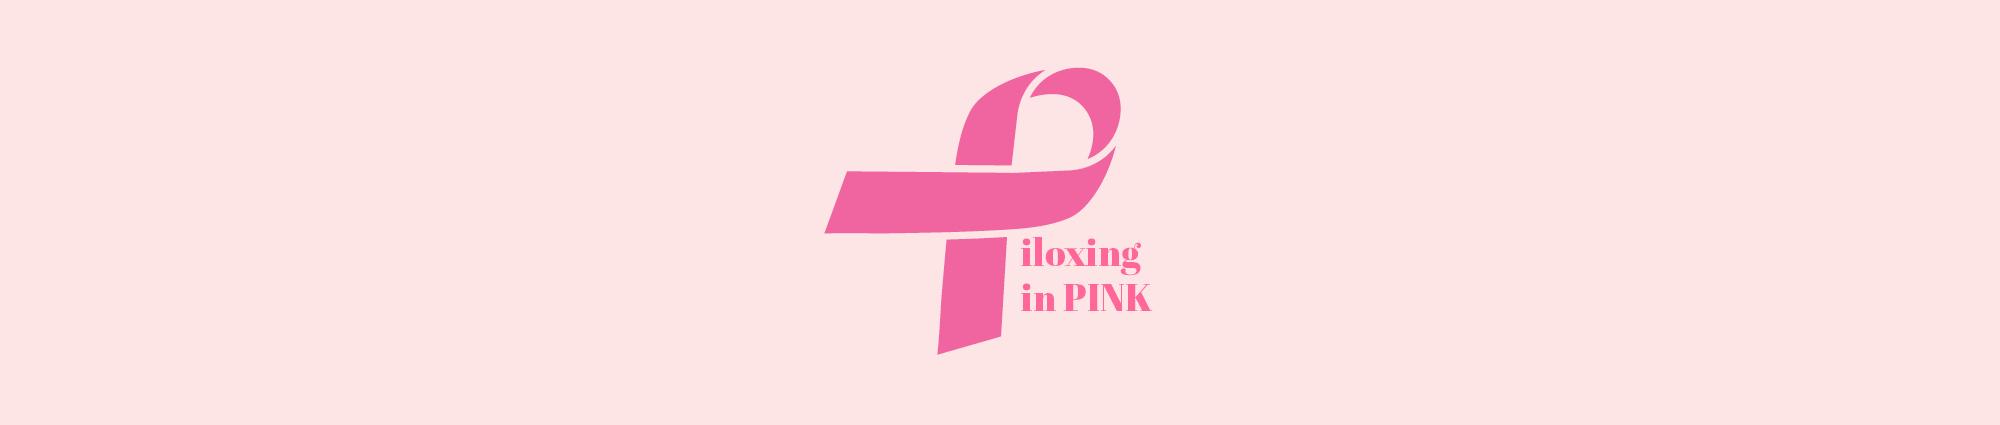 Piloxing in PINK